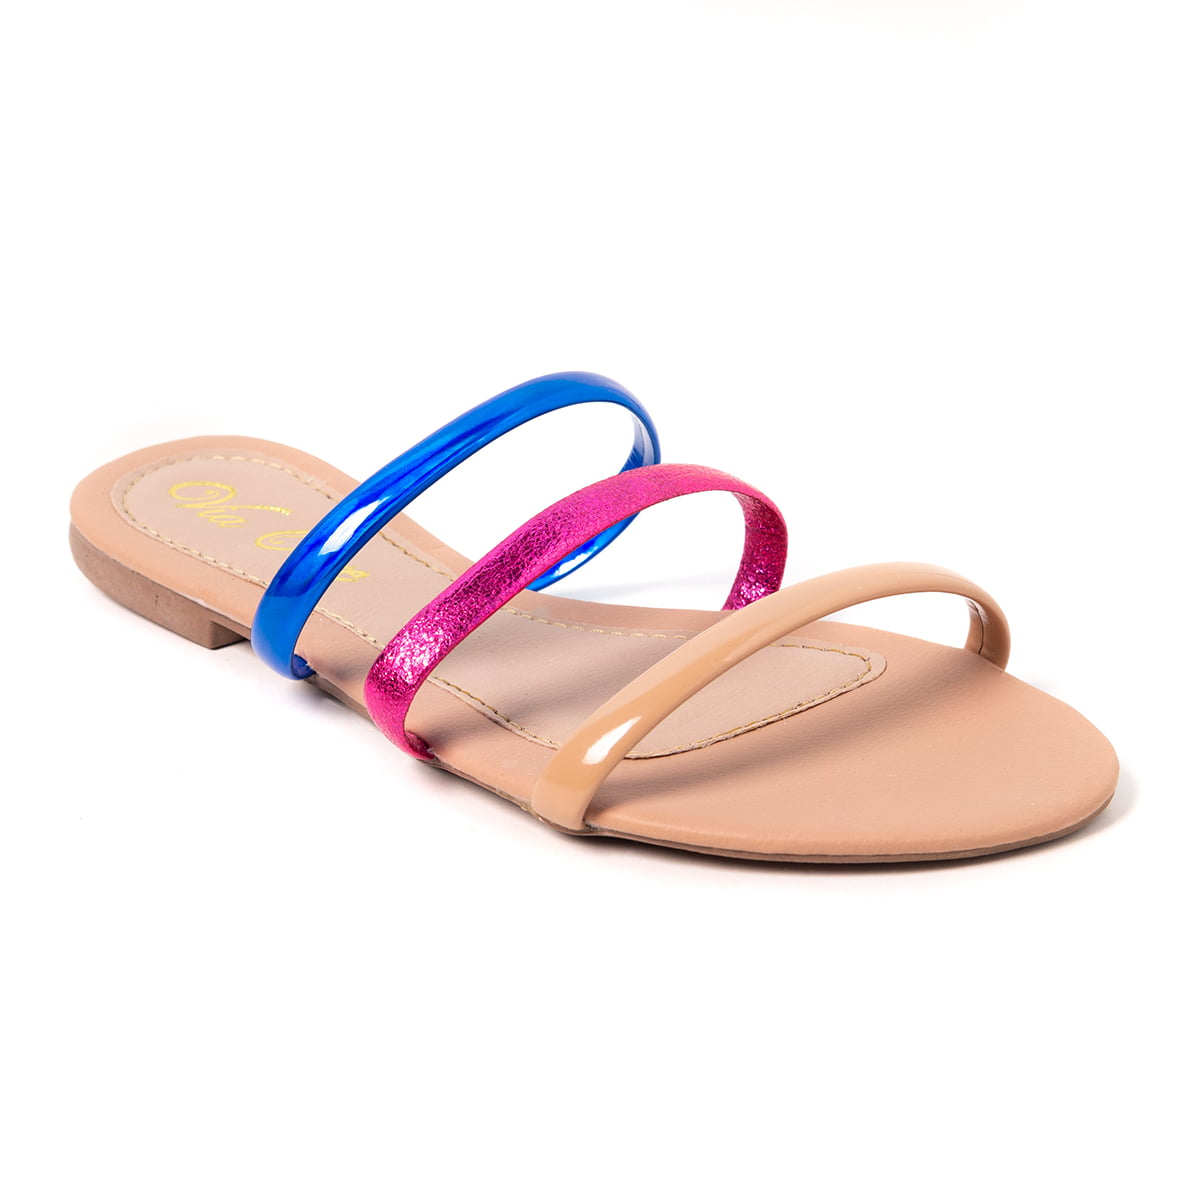 Sandália Rasteira Multicolor Napa Nude e Pink